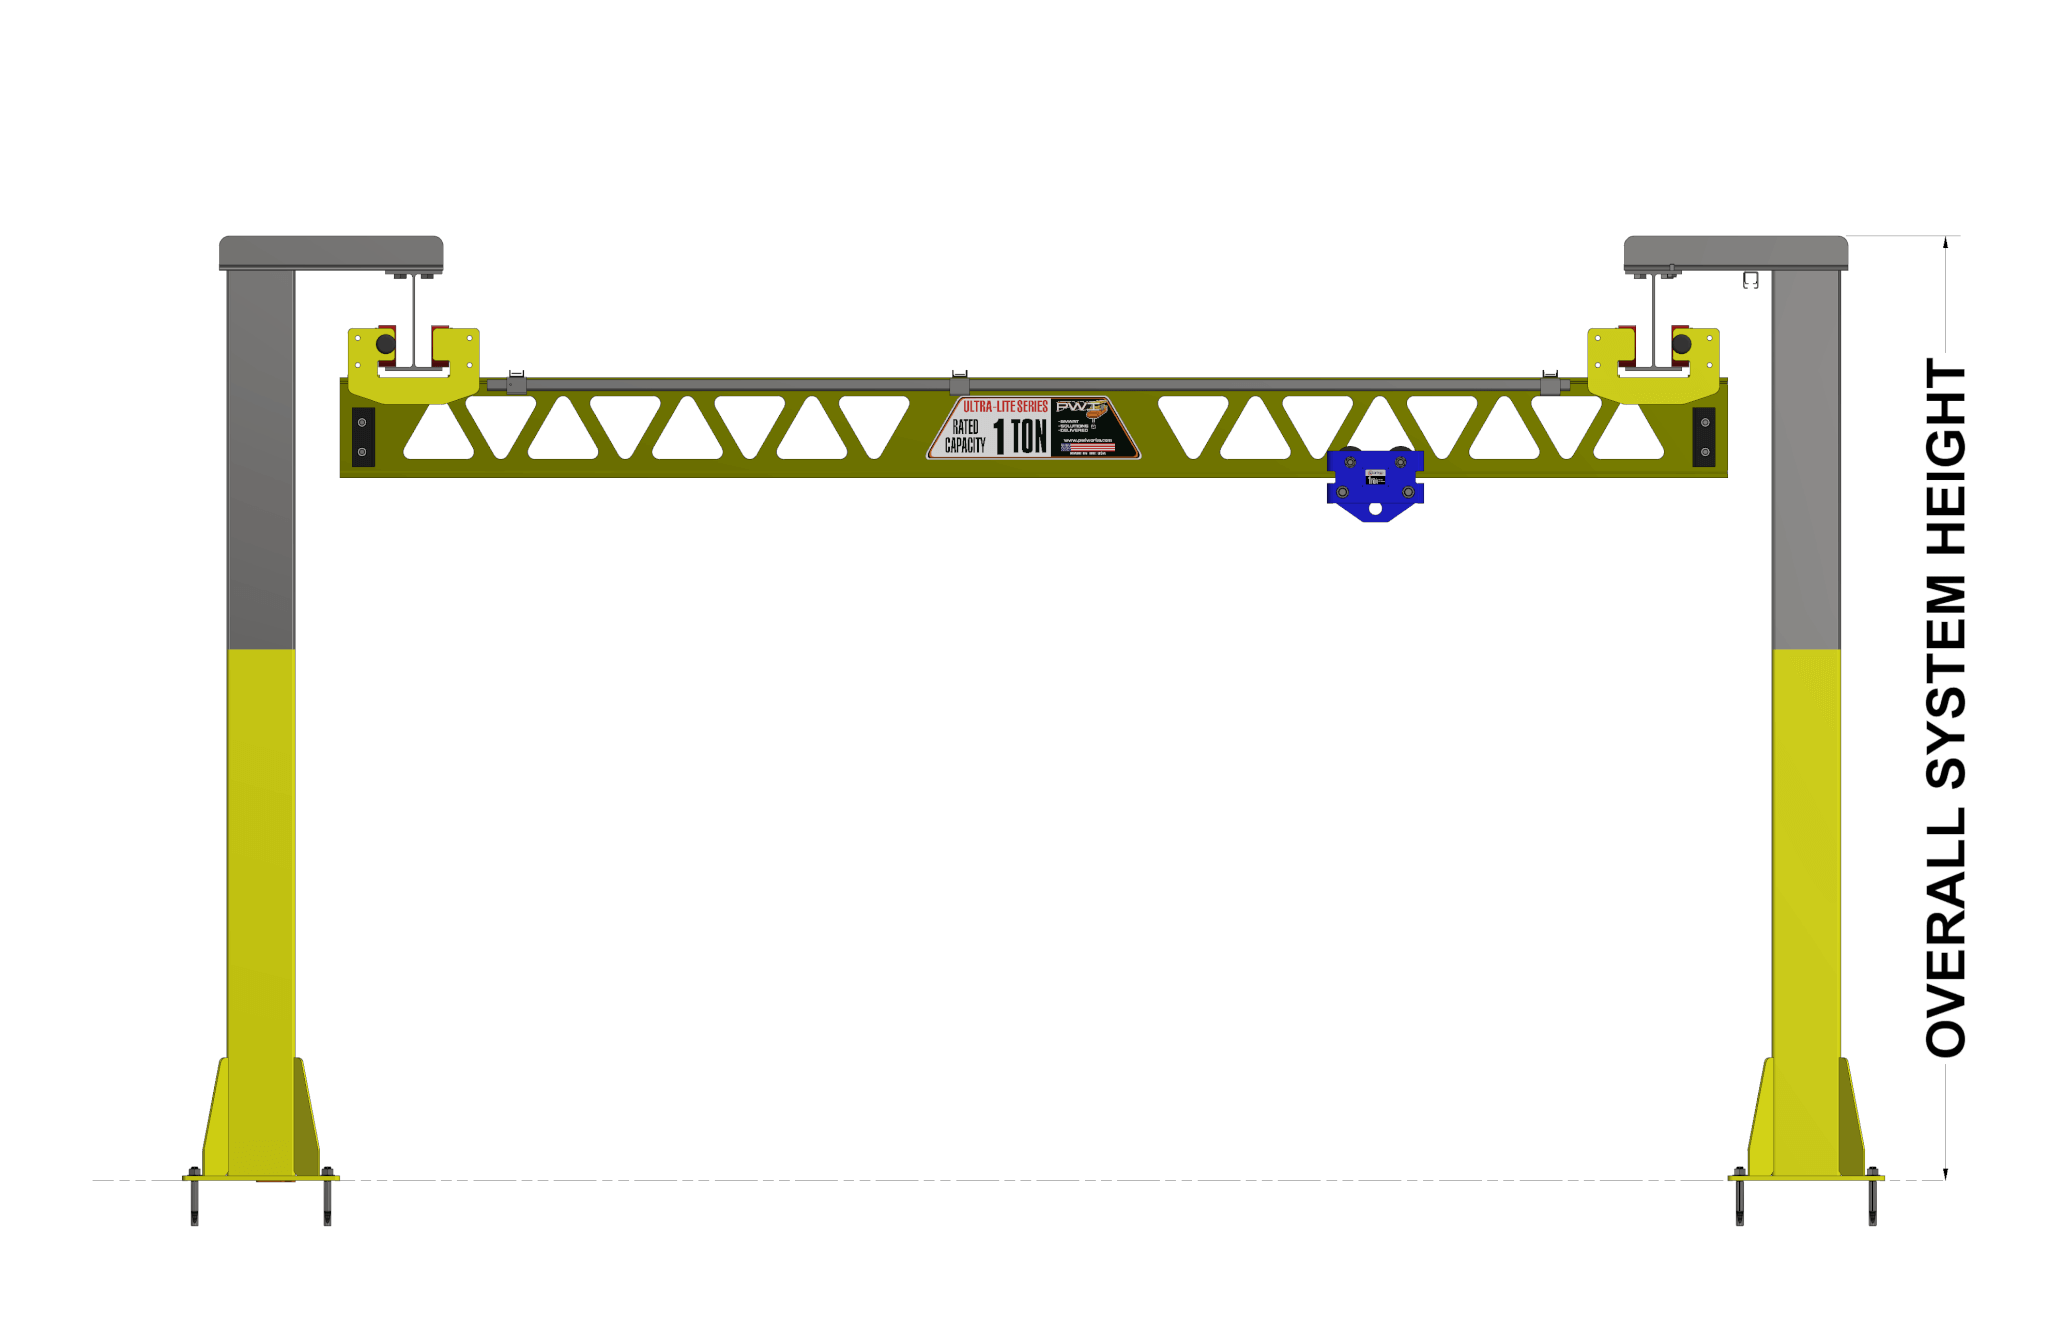 pwi ultra-lite freestanding bridge crane overall system height